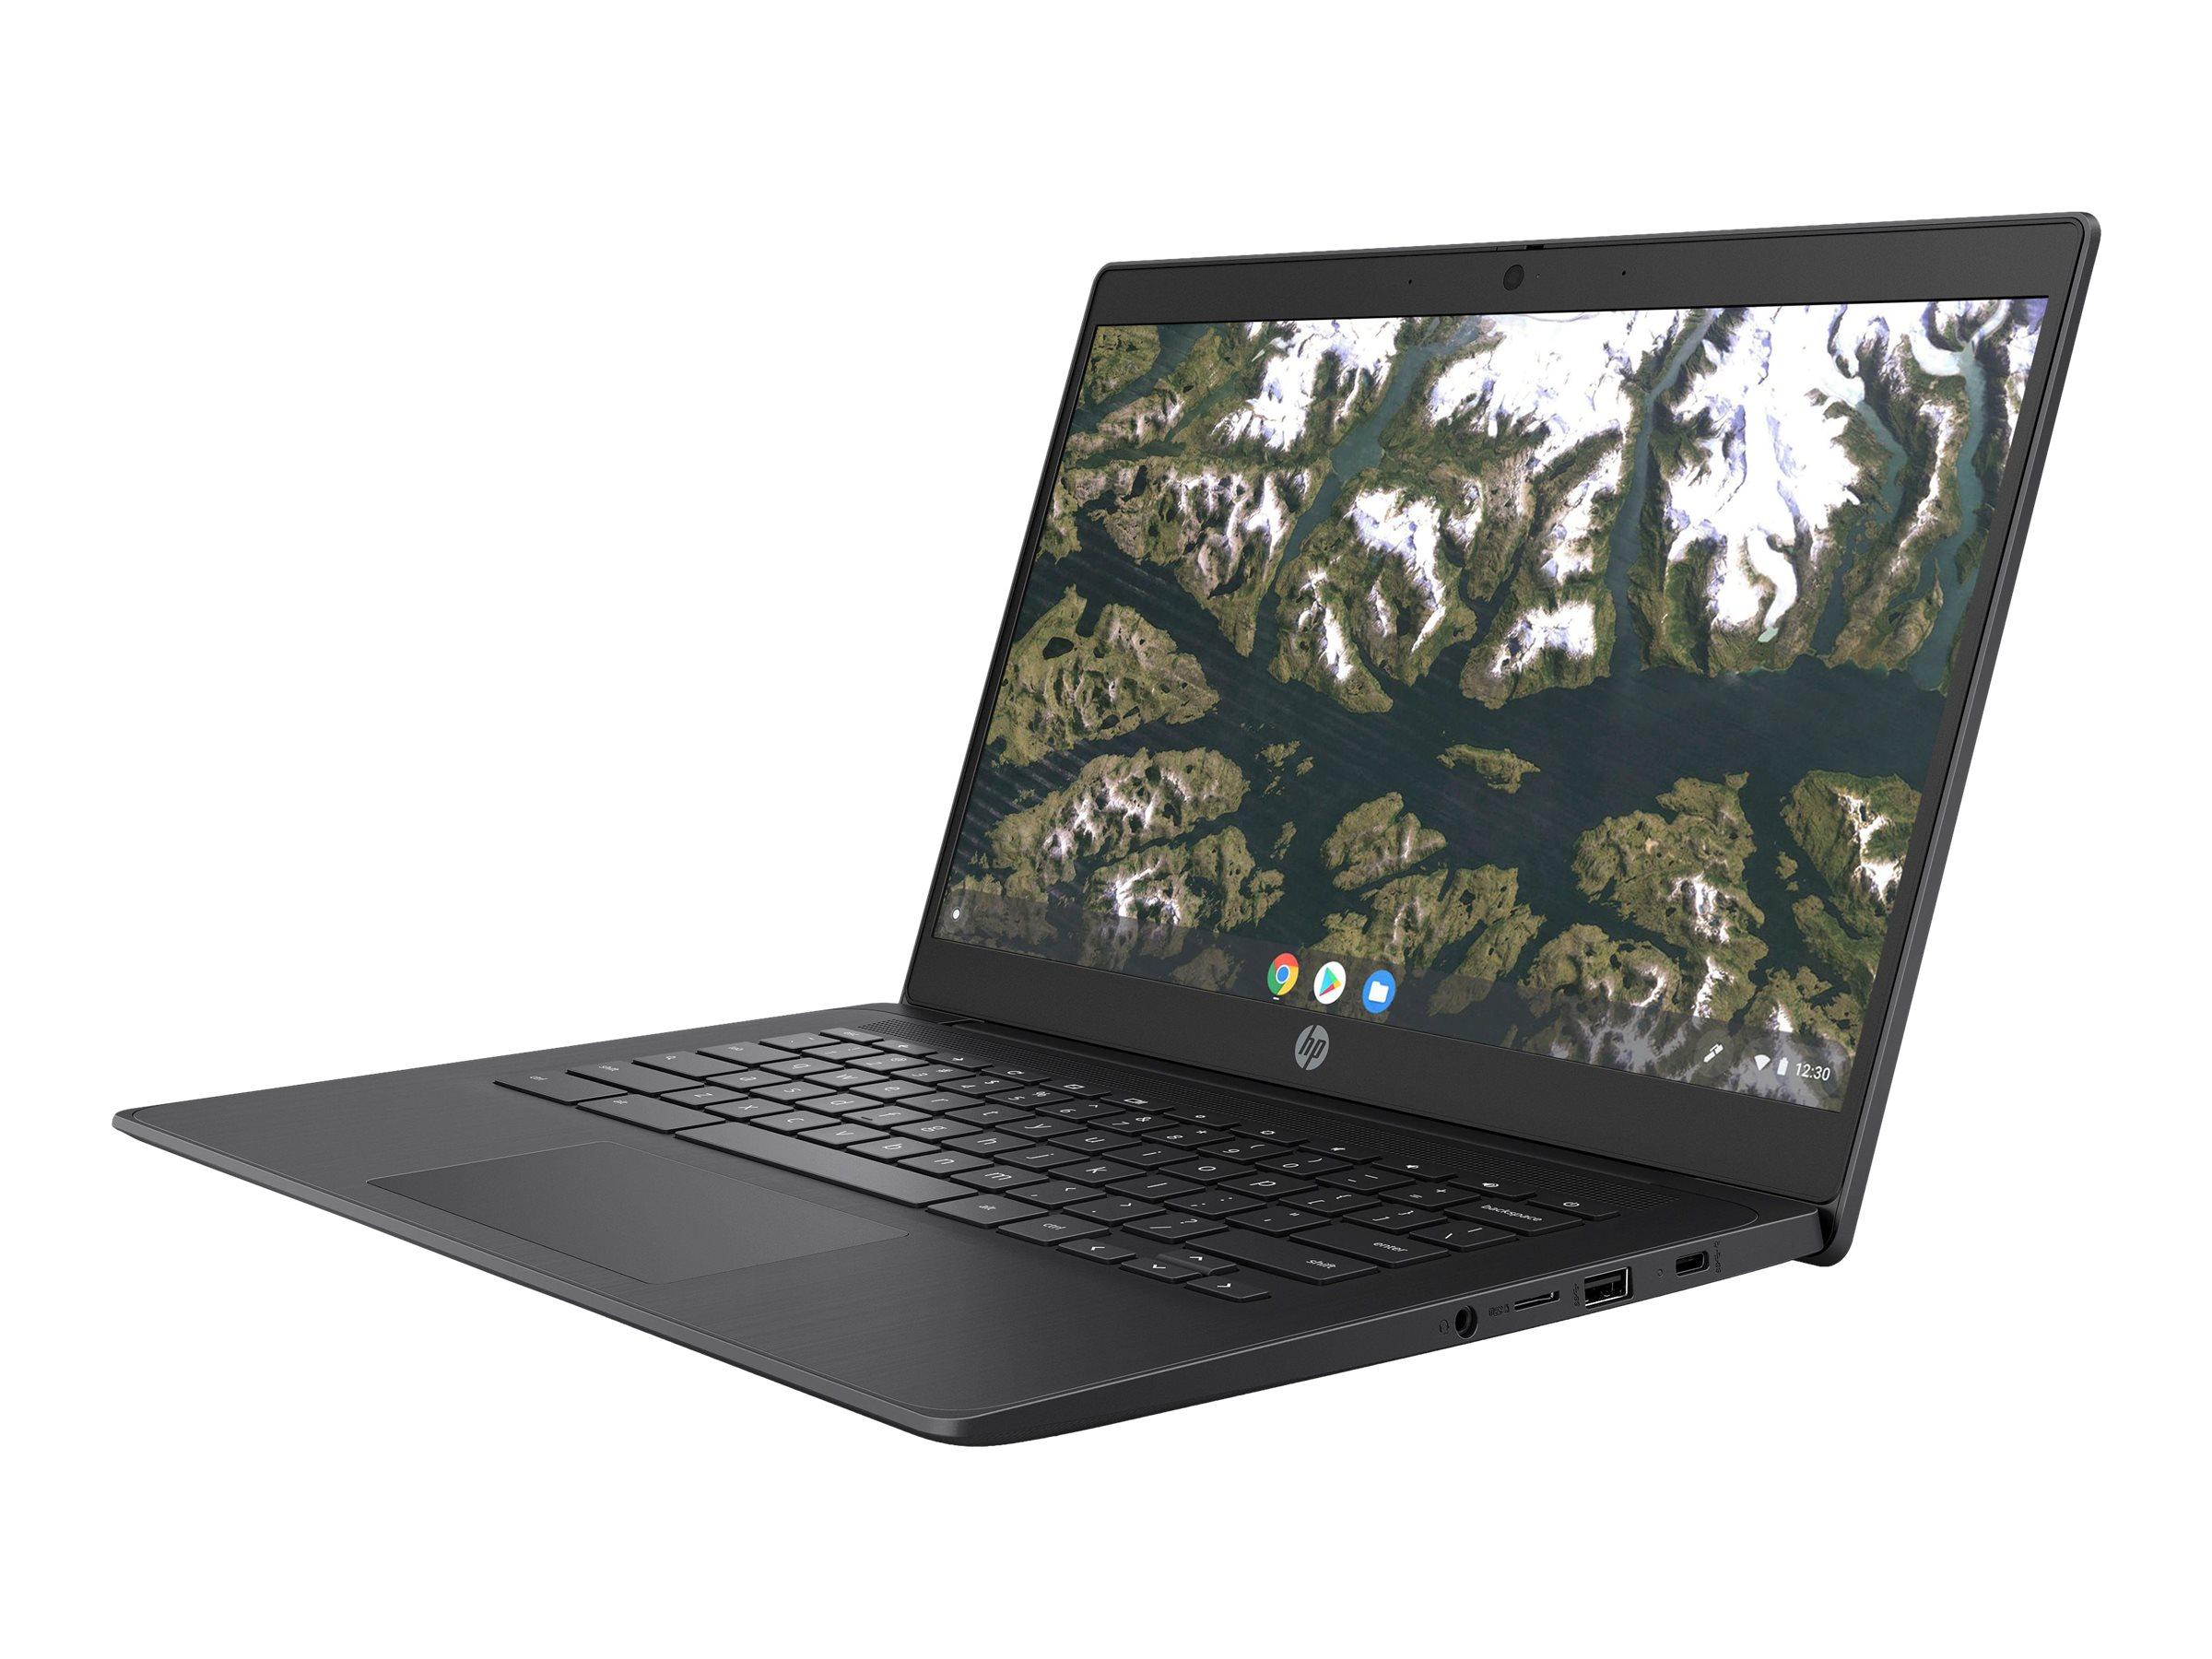 "HP Chromebook 14 G6 - Celeron N4020 / 1.1 GHz - Chrome OS 64 - 4 GB RAM - 32 GB eMMC - 35.56 cm (14"")"